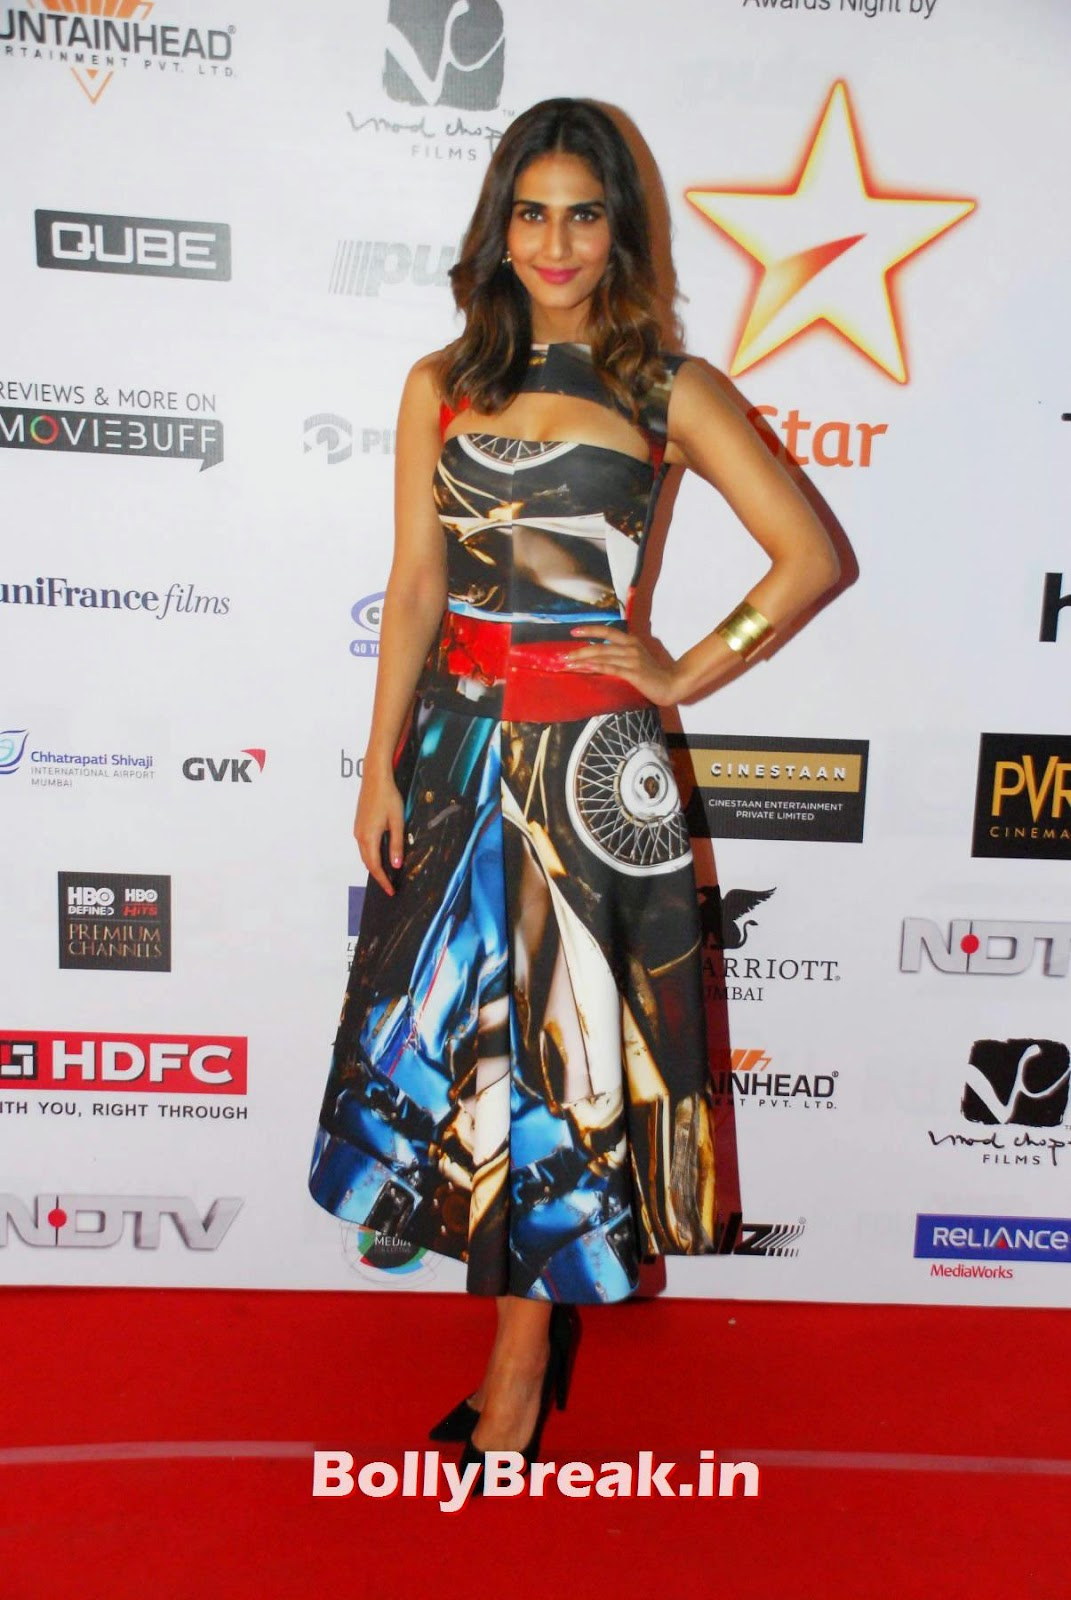 , Vaani Kapoor Latest Photos 2014 on Red Carpet